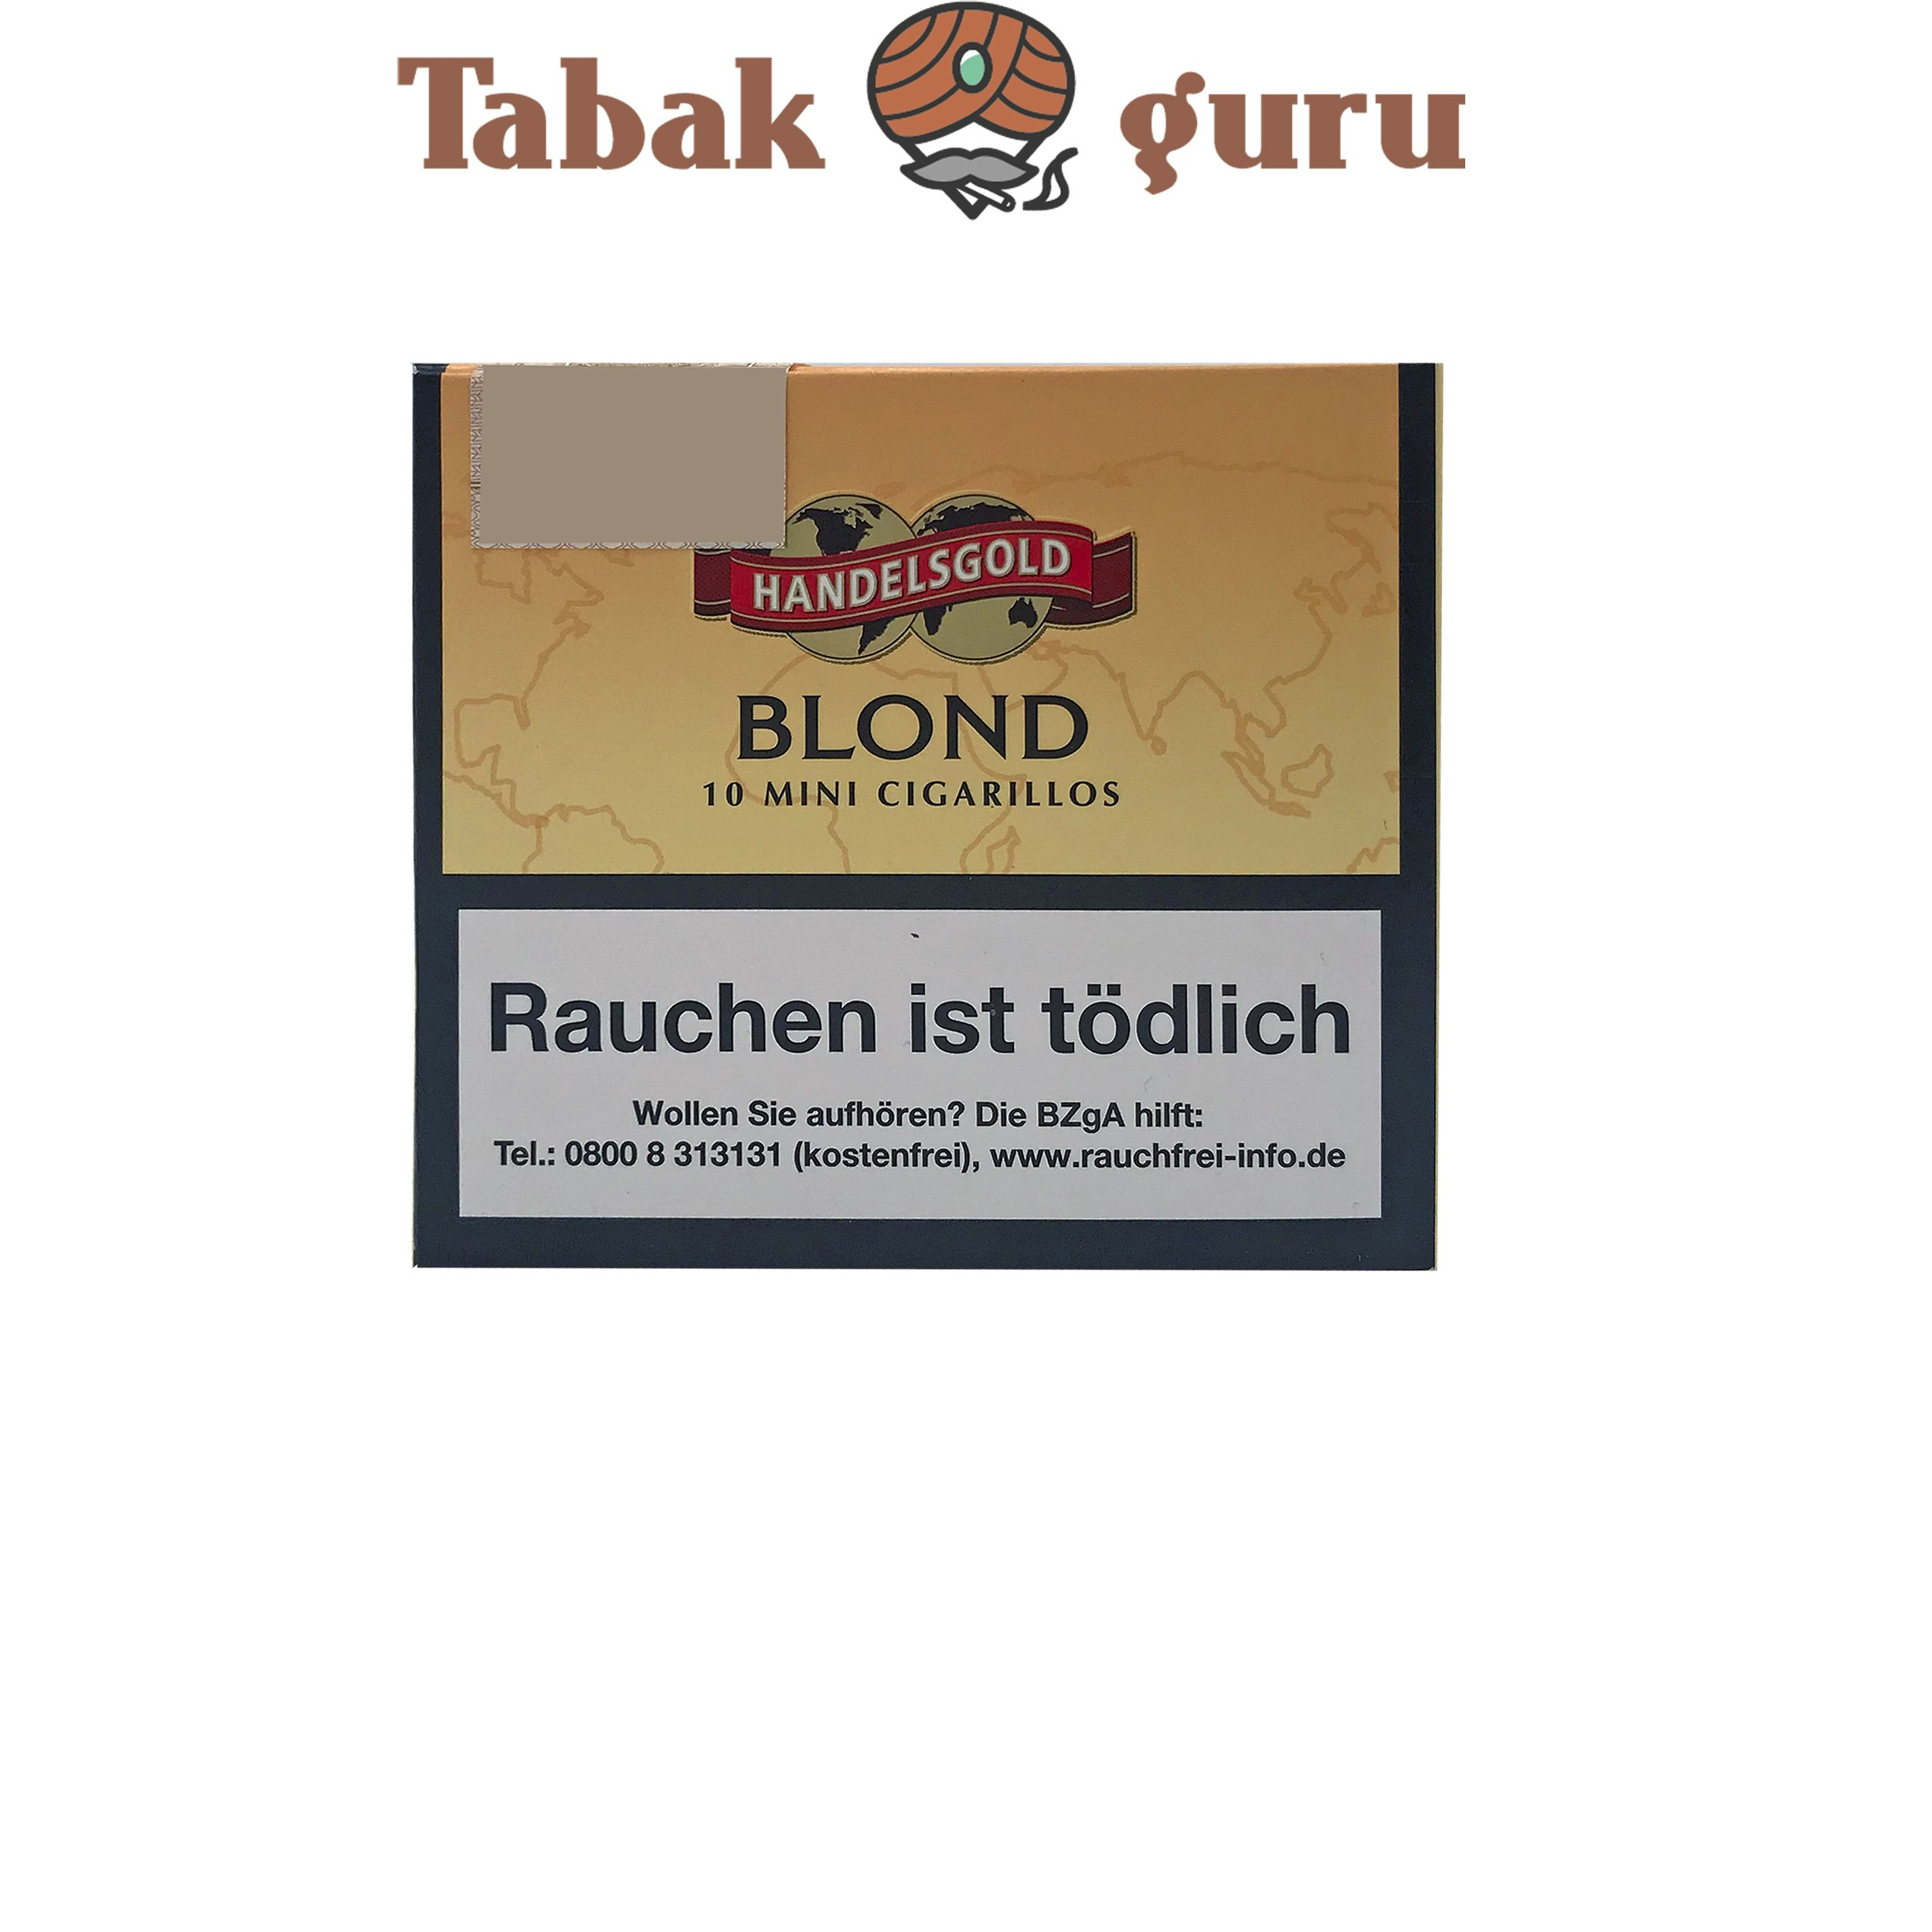 Handelsgold Mini Blond No. 261 (Vanilla) Filterzigarillos a 10 Stück